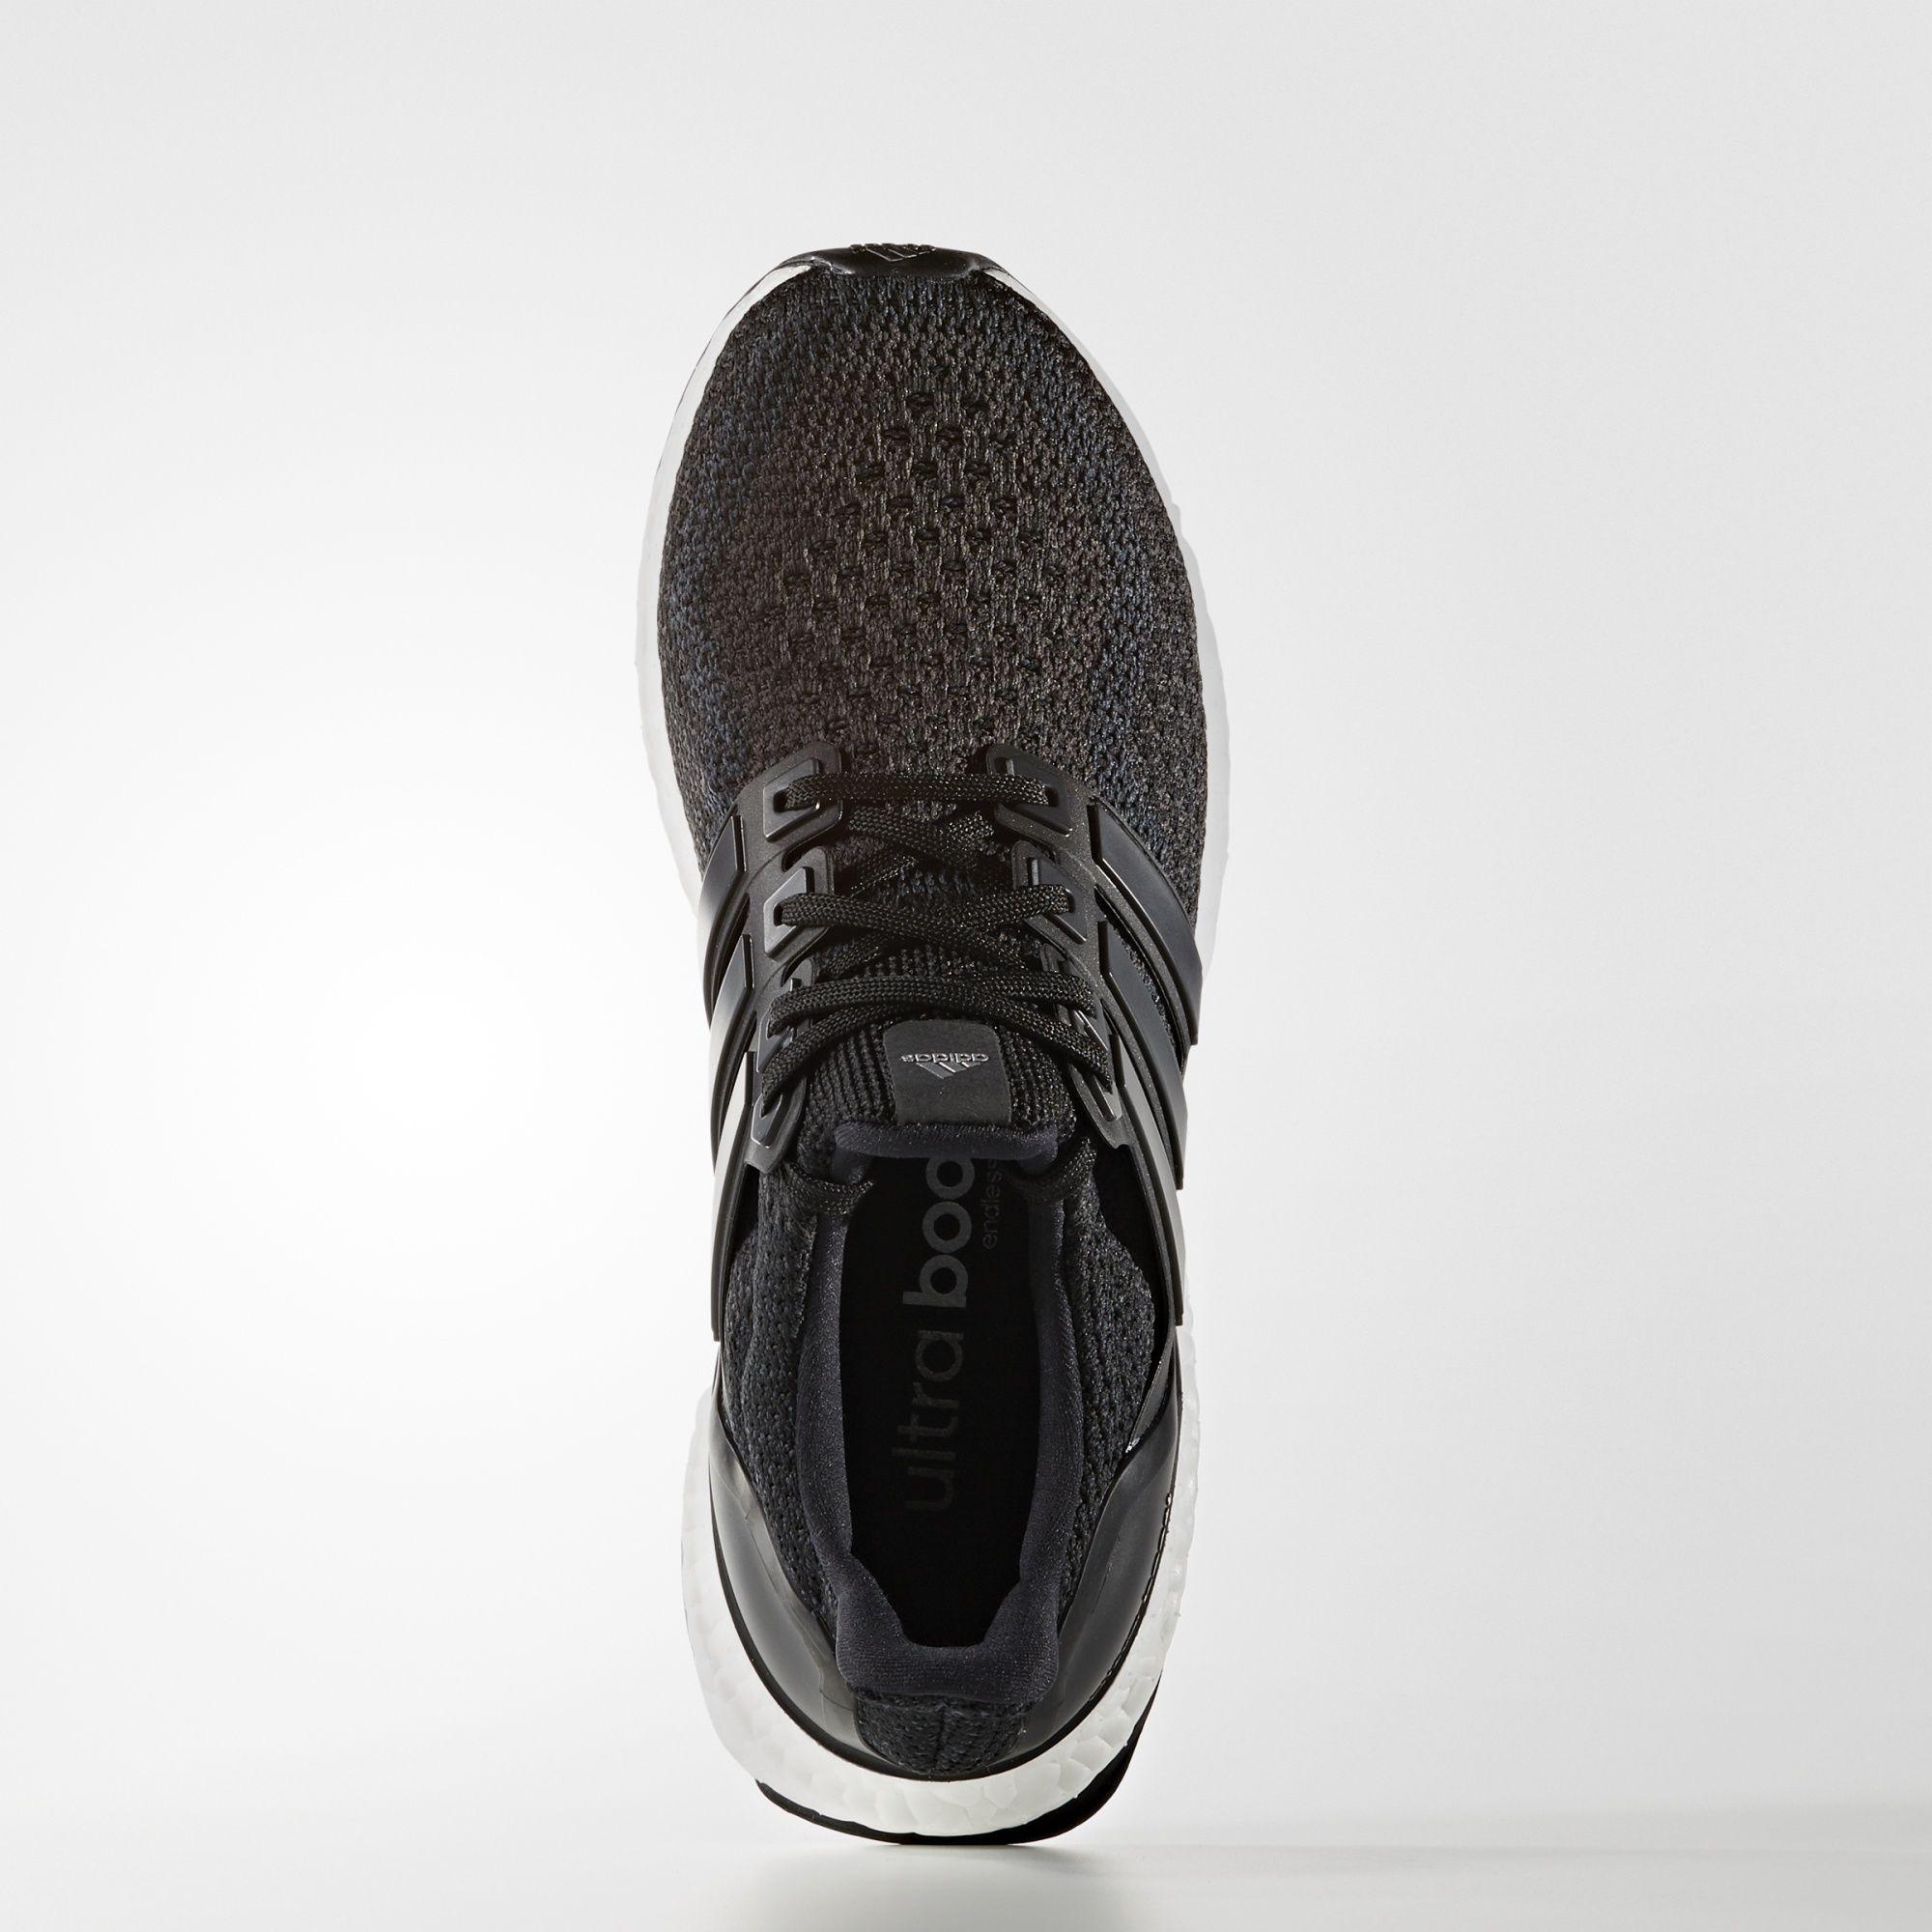 separation shoes 0da58 6ef12 adidas - ULTRABOOST Shoes | Foot gear | Adidas shoes, Adidas ...